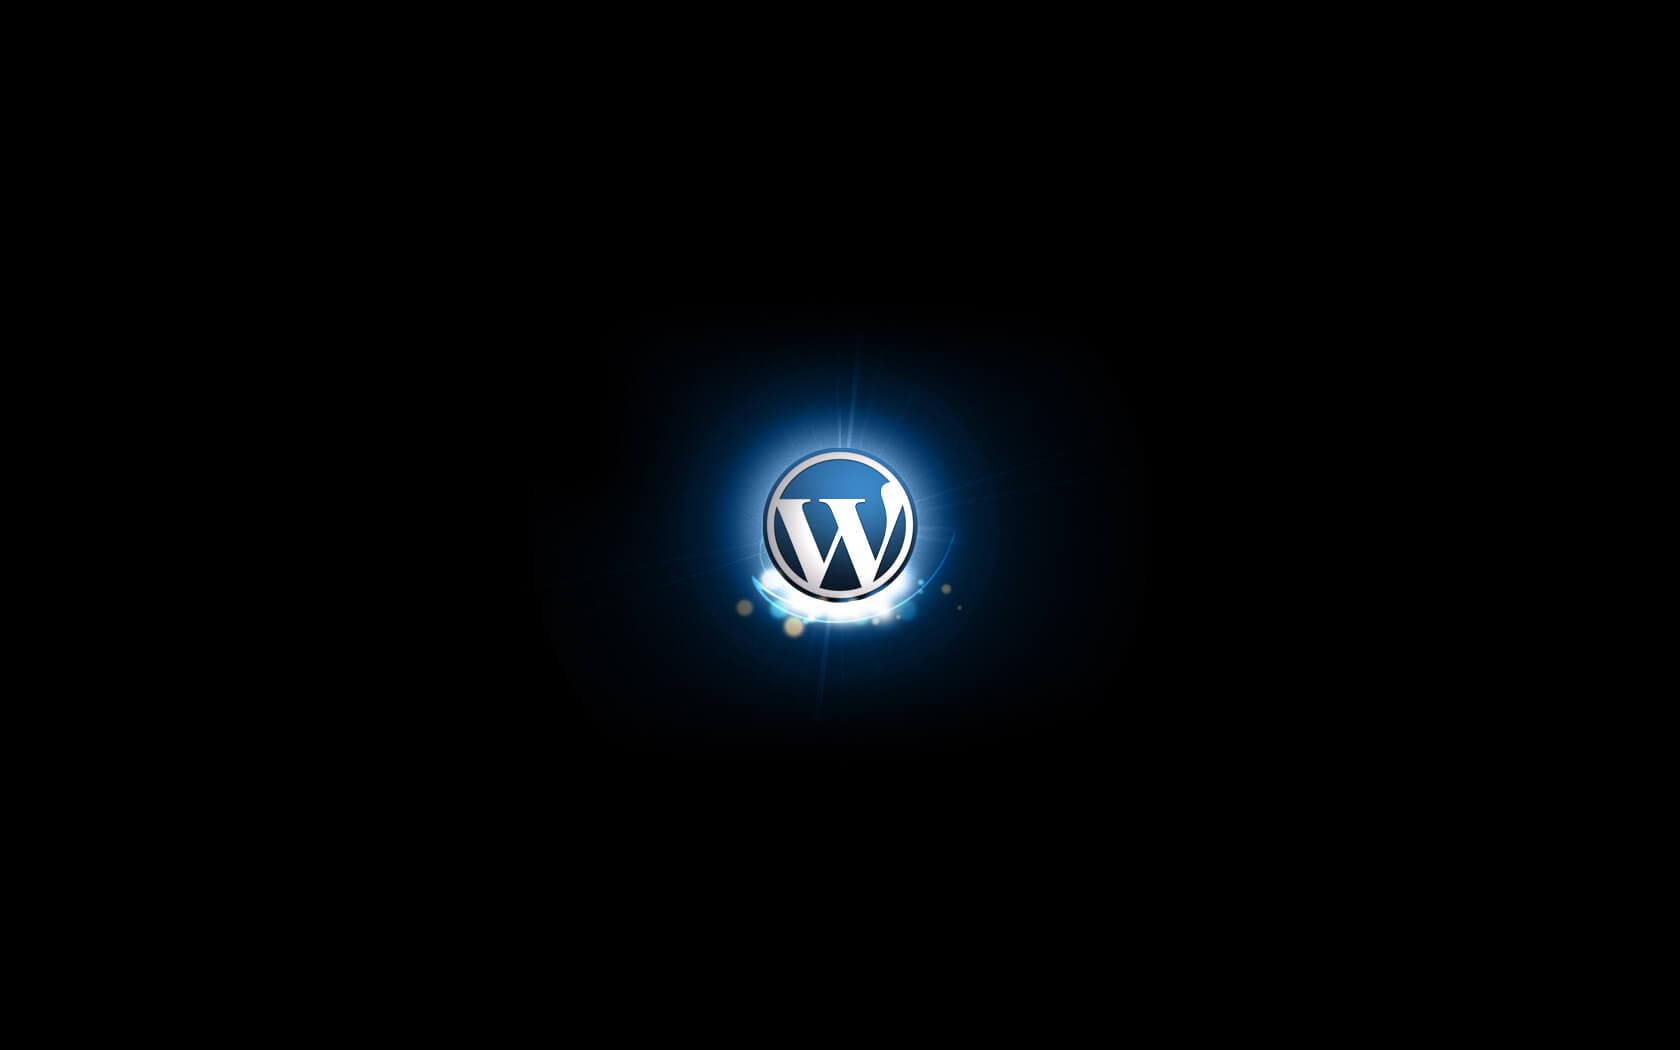 Wordpress Wallpaper 5 - WordPress WallPapers